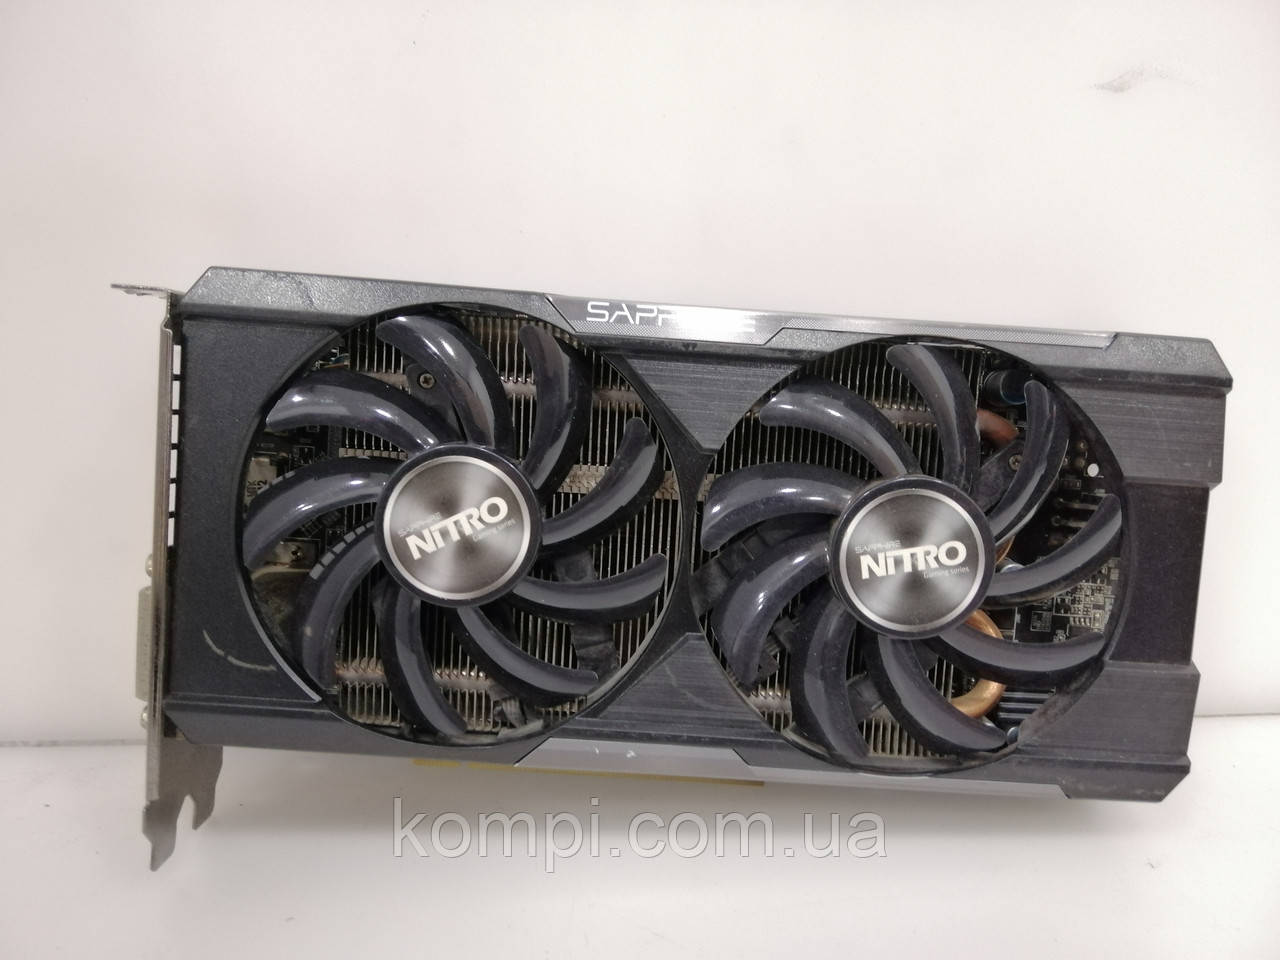 Видеокарта SAPPHIRE Radeon R9 370 4GB  PCI-E HDMI DX12